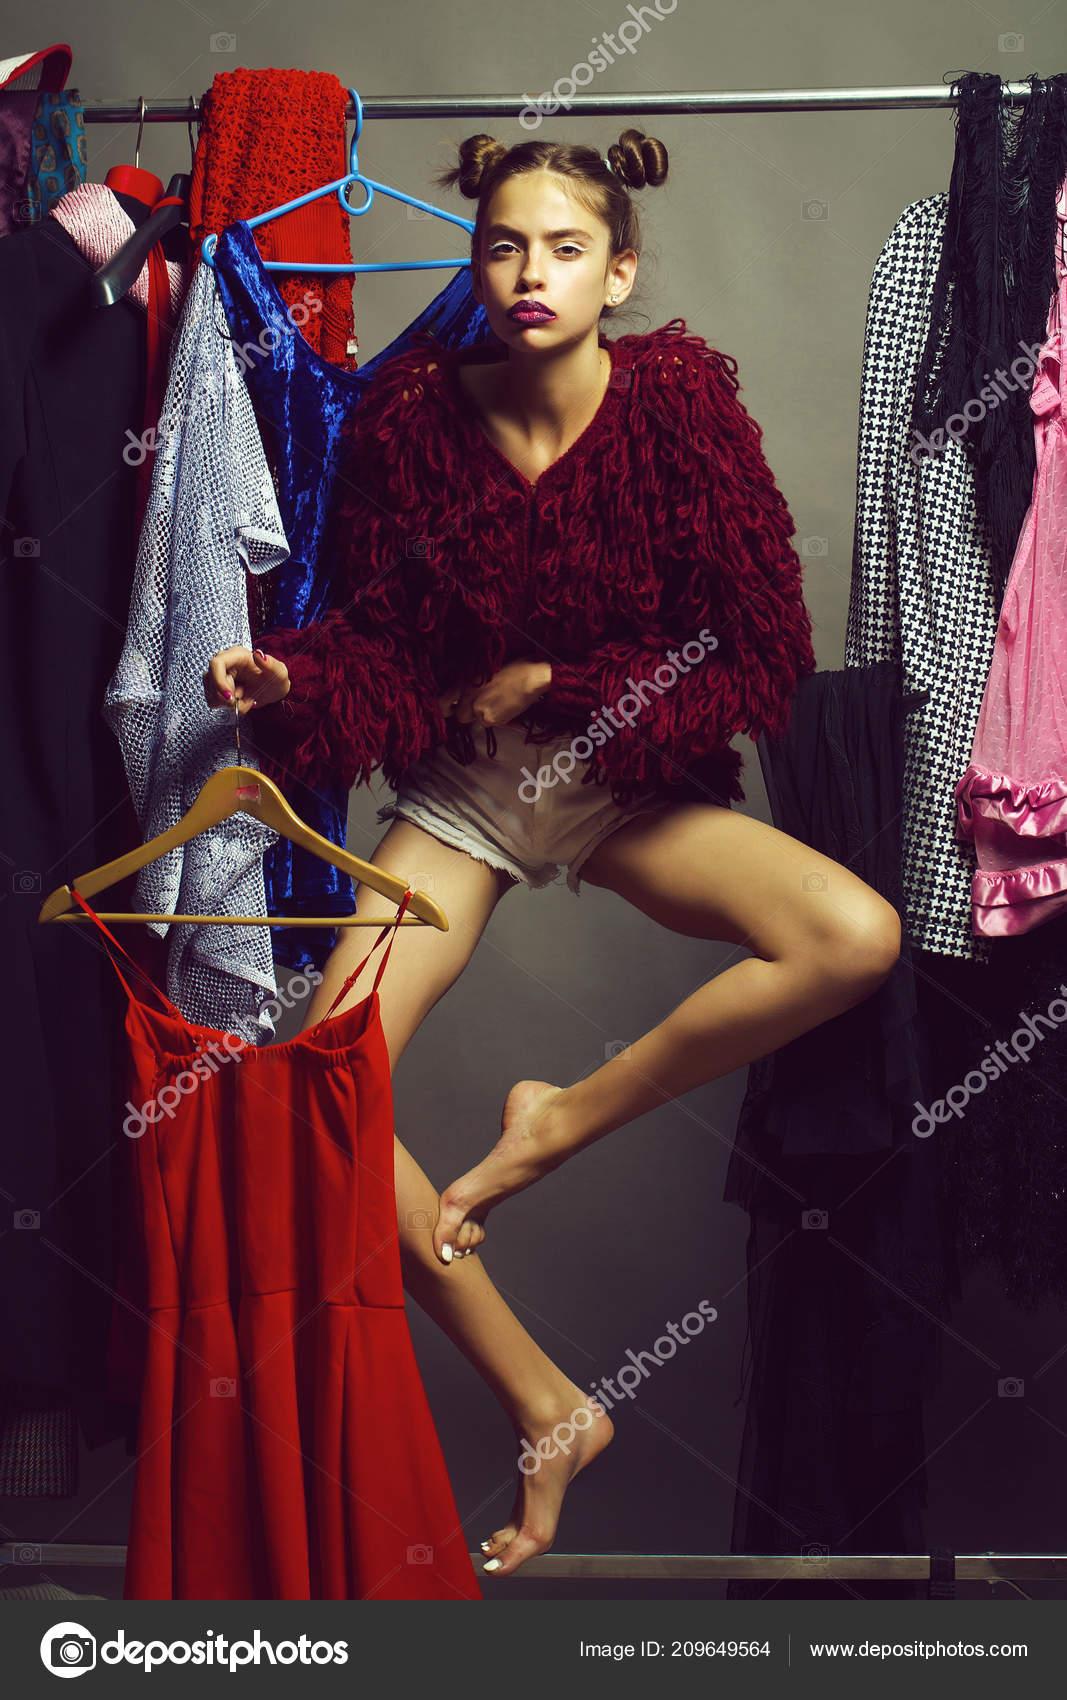 Девушка на фоне шкафа, у фигуристки слетели трусы